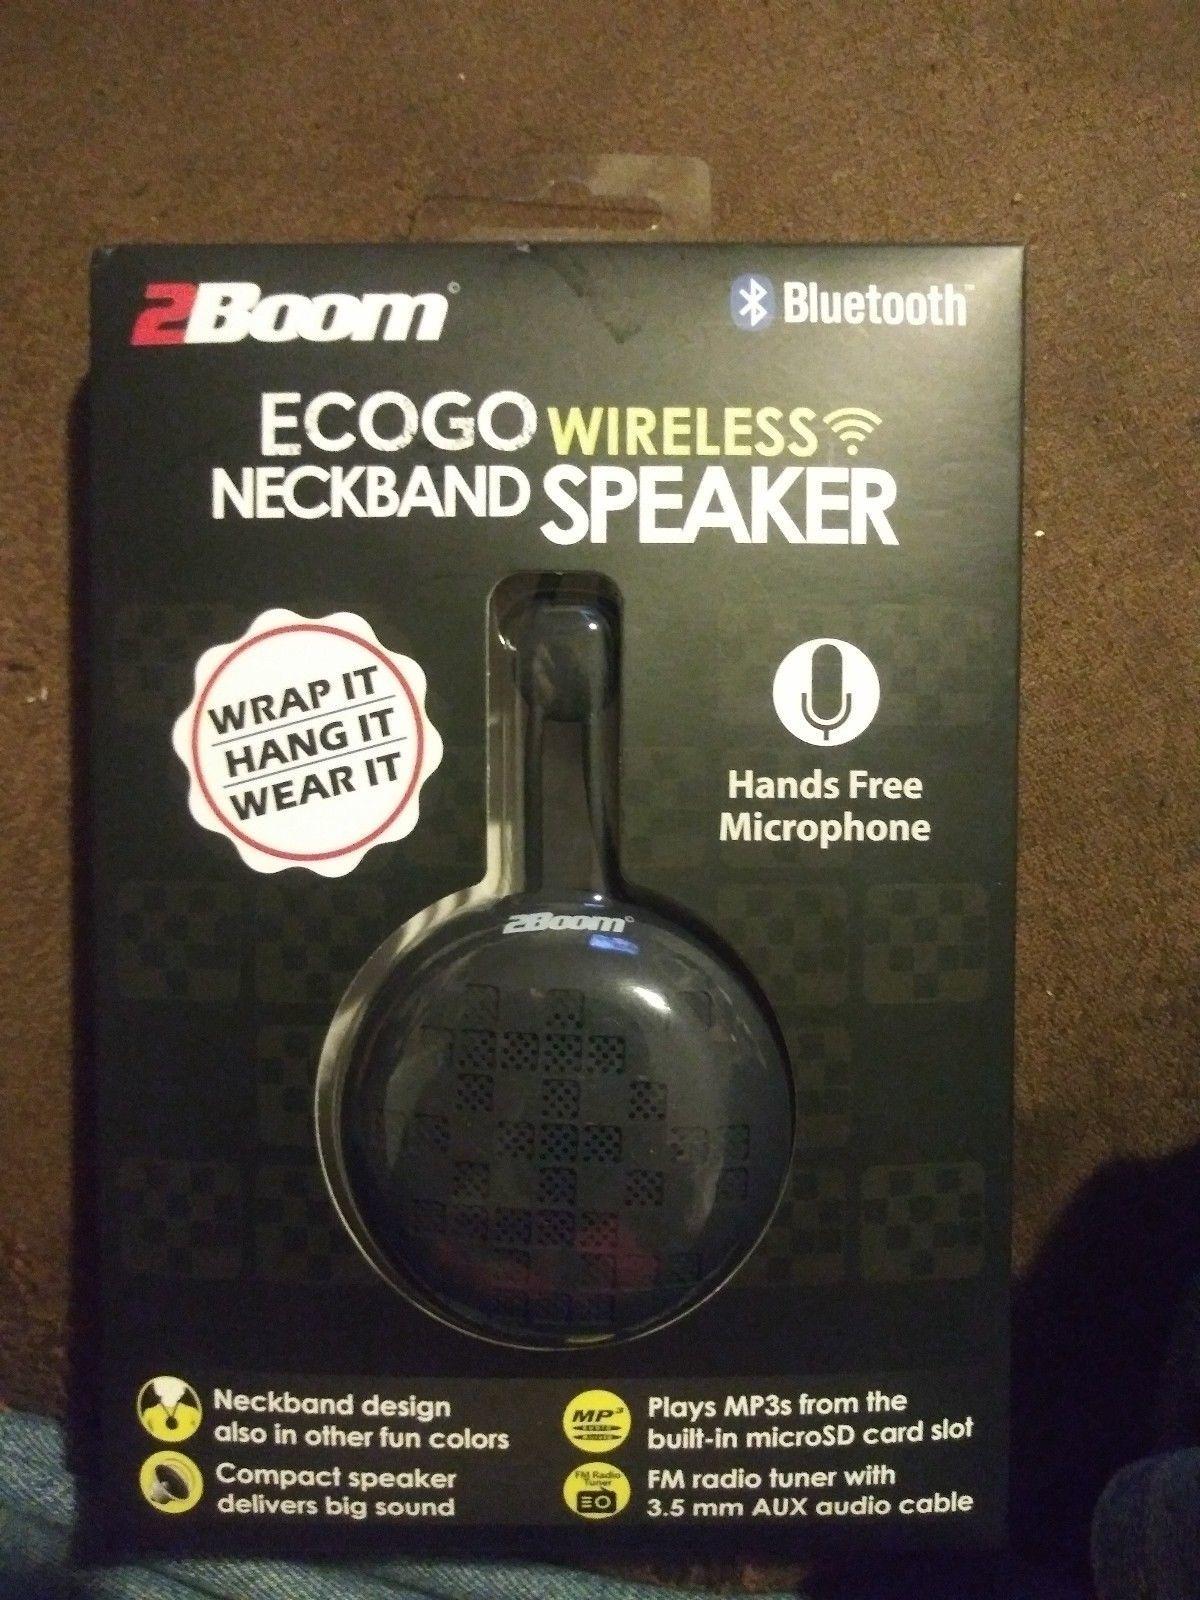 2Boom ECOGO Wireless Bluetooth Neckband and 50 similar items